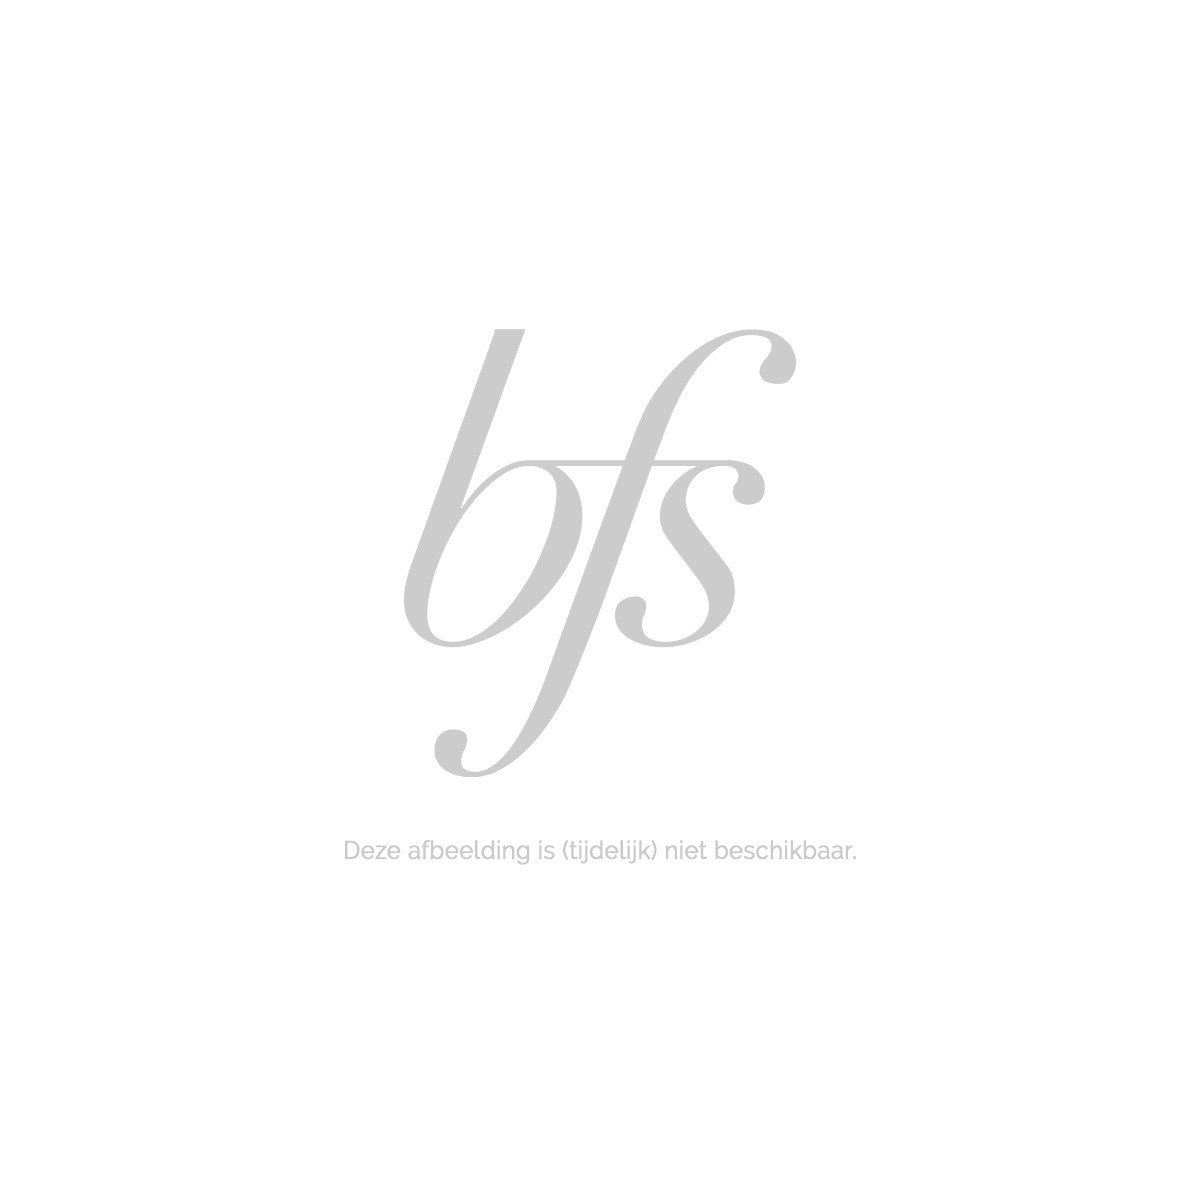 Sensai Flawless Satin Foundation Spf20 #103 Sand Beige 30 Ml